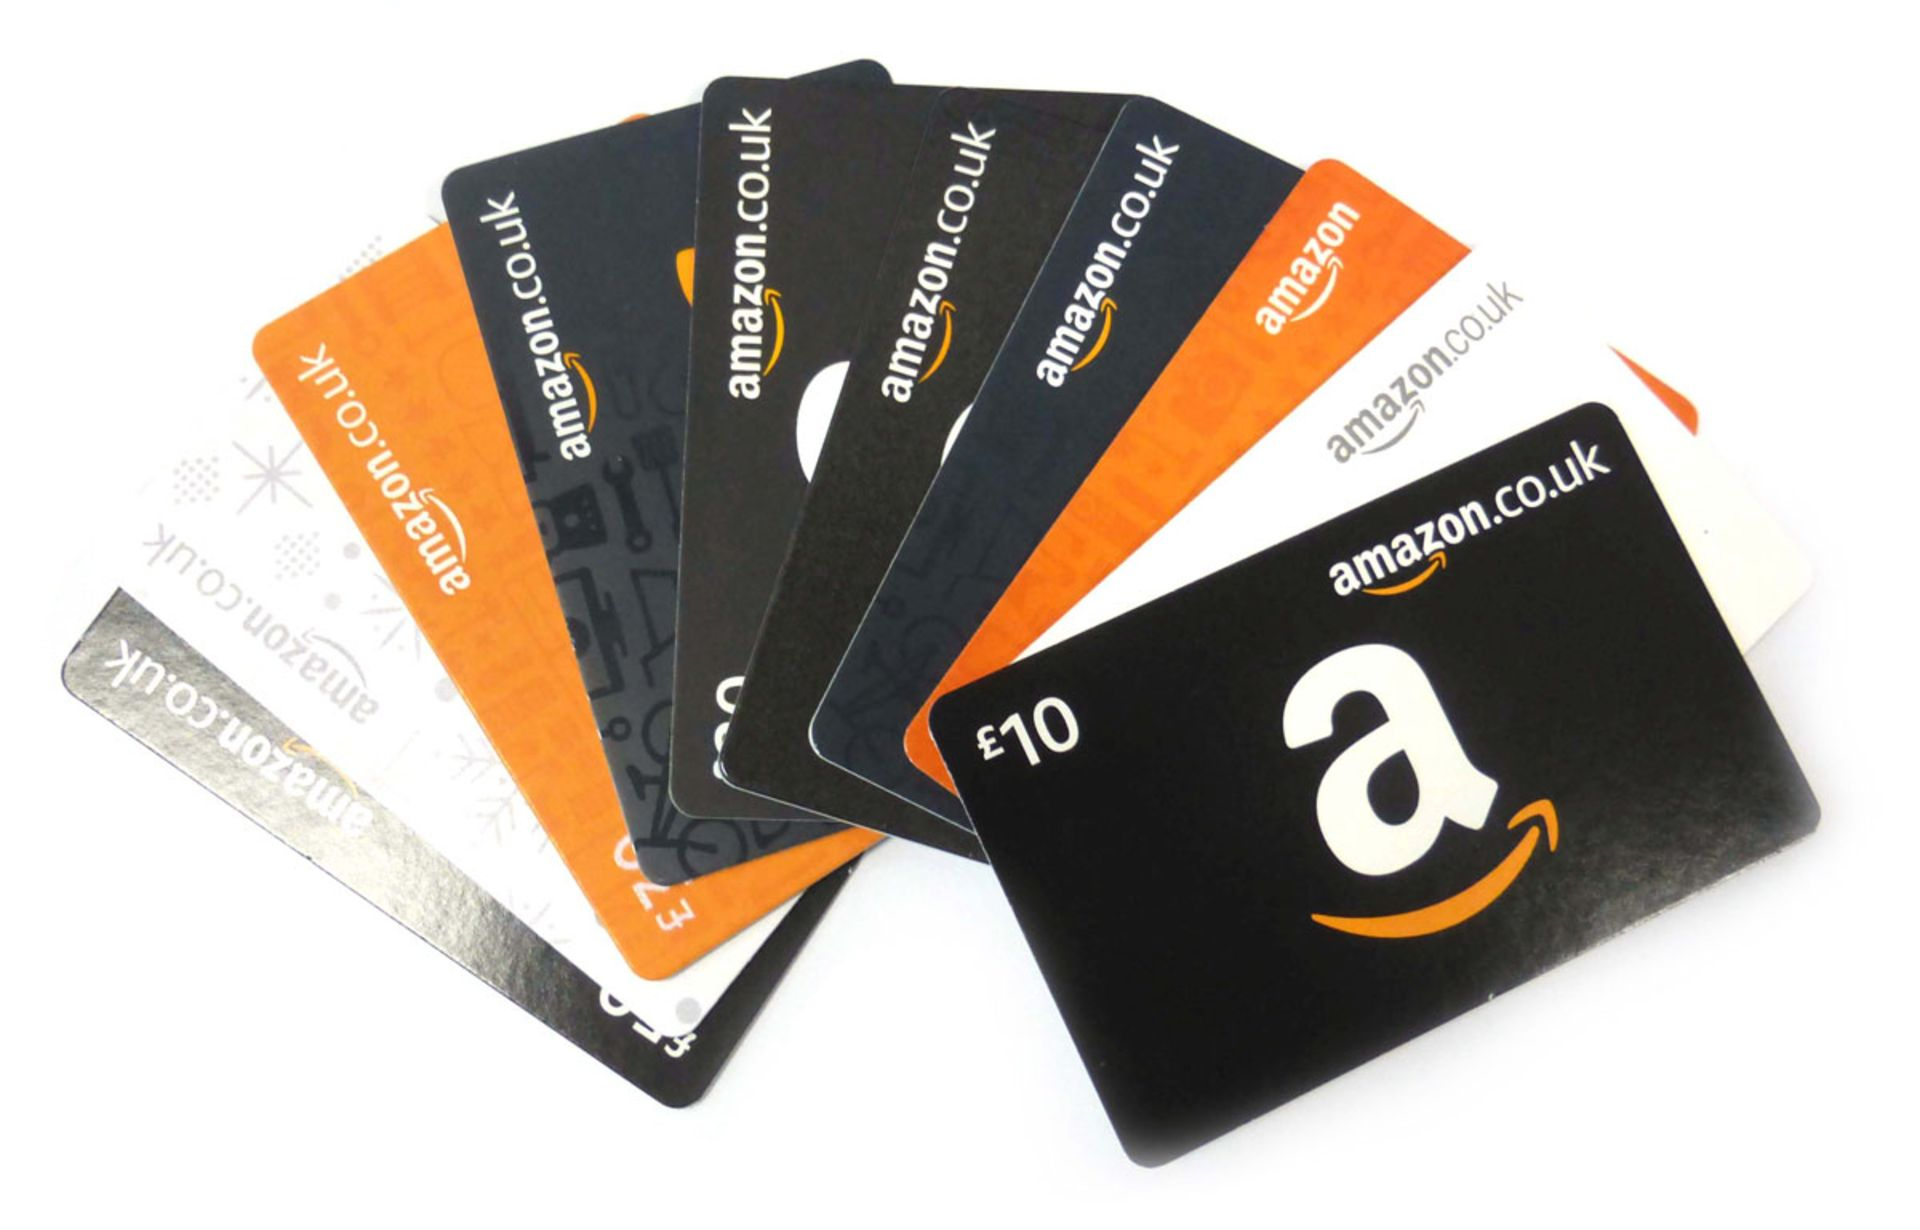 Amazon (x10) - Total face value £216